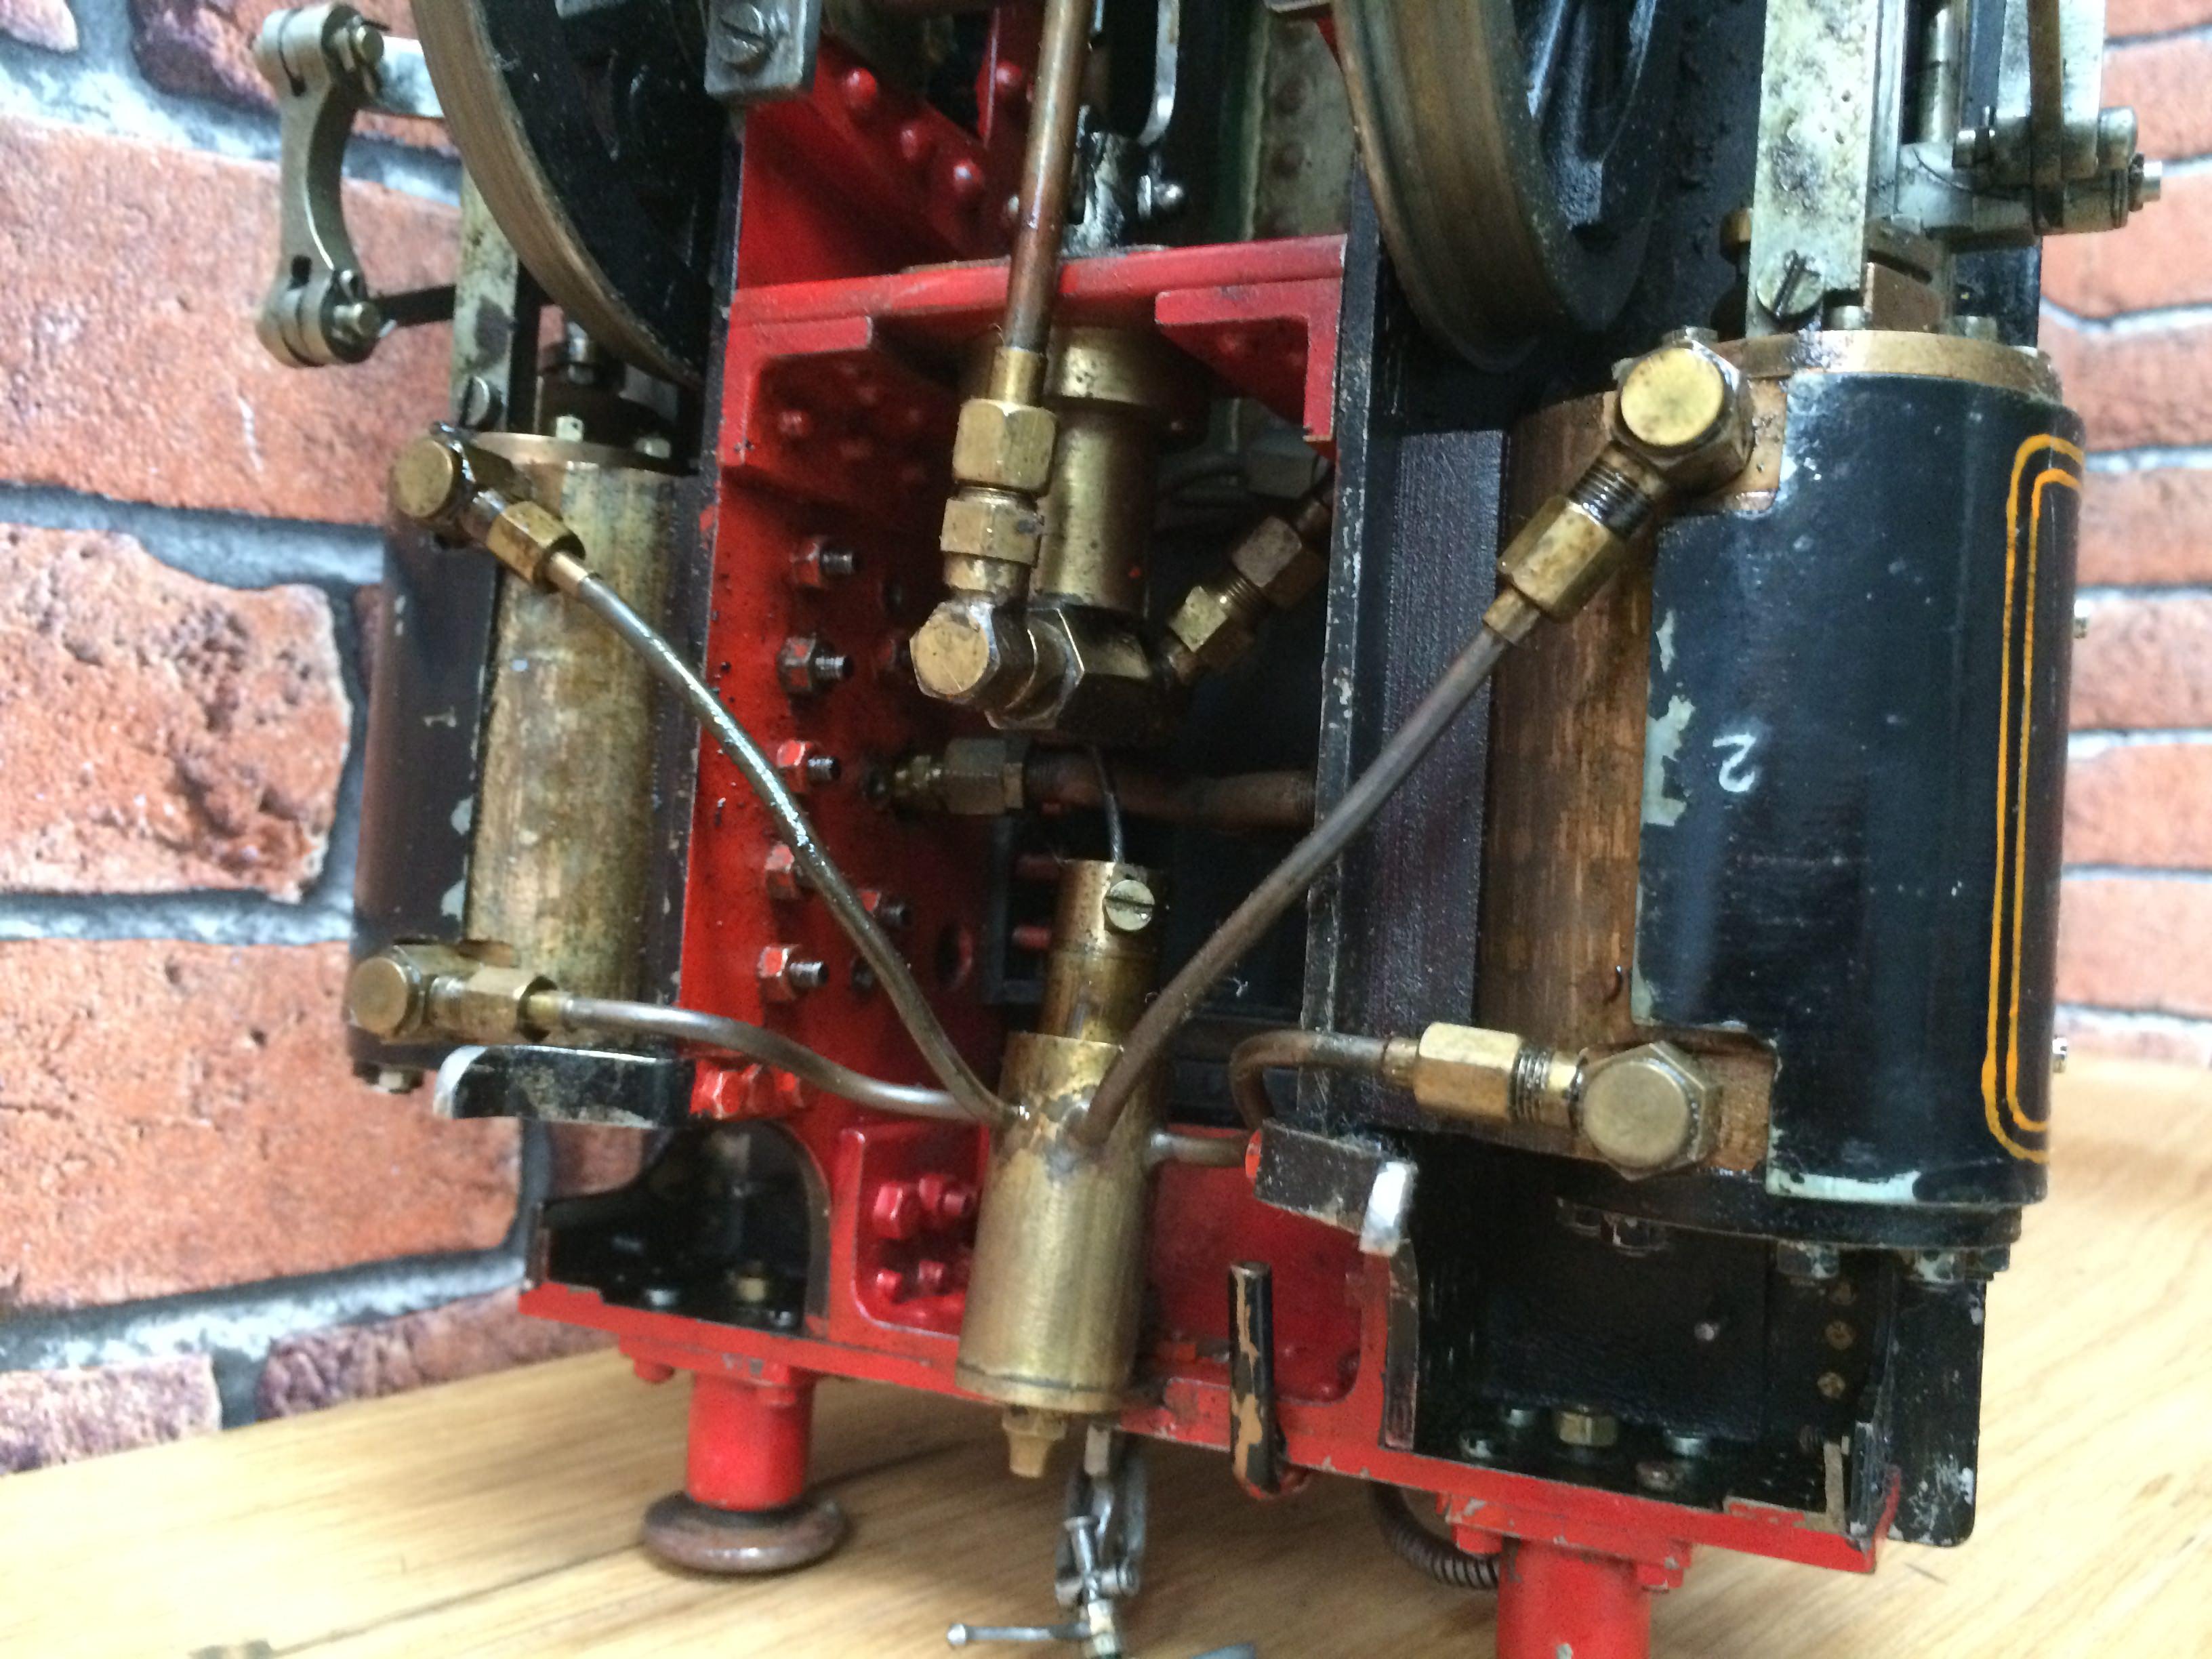 test 3 inch gauge freelance live steam tank engine for sale 22